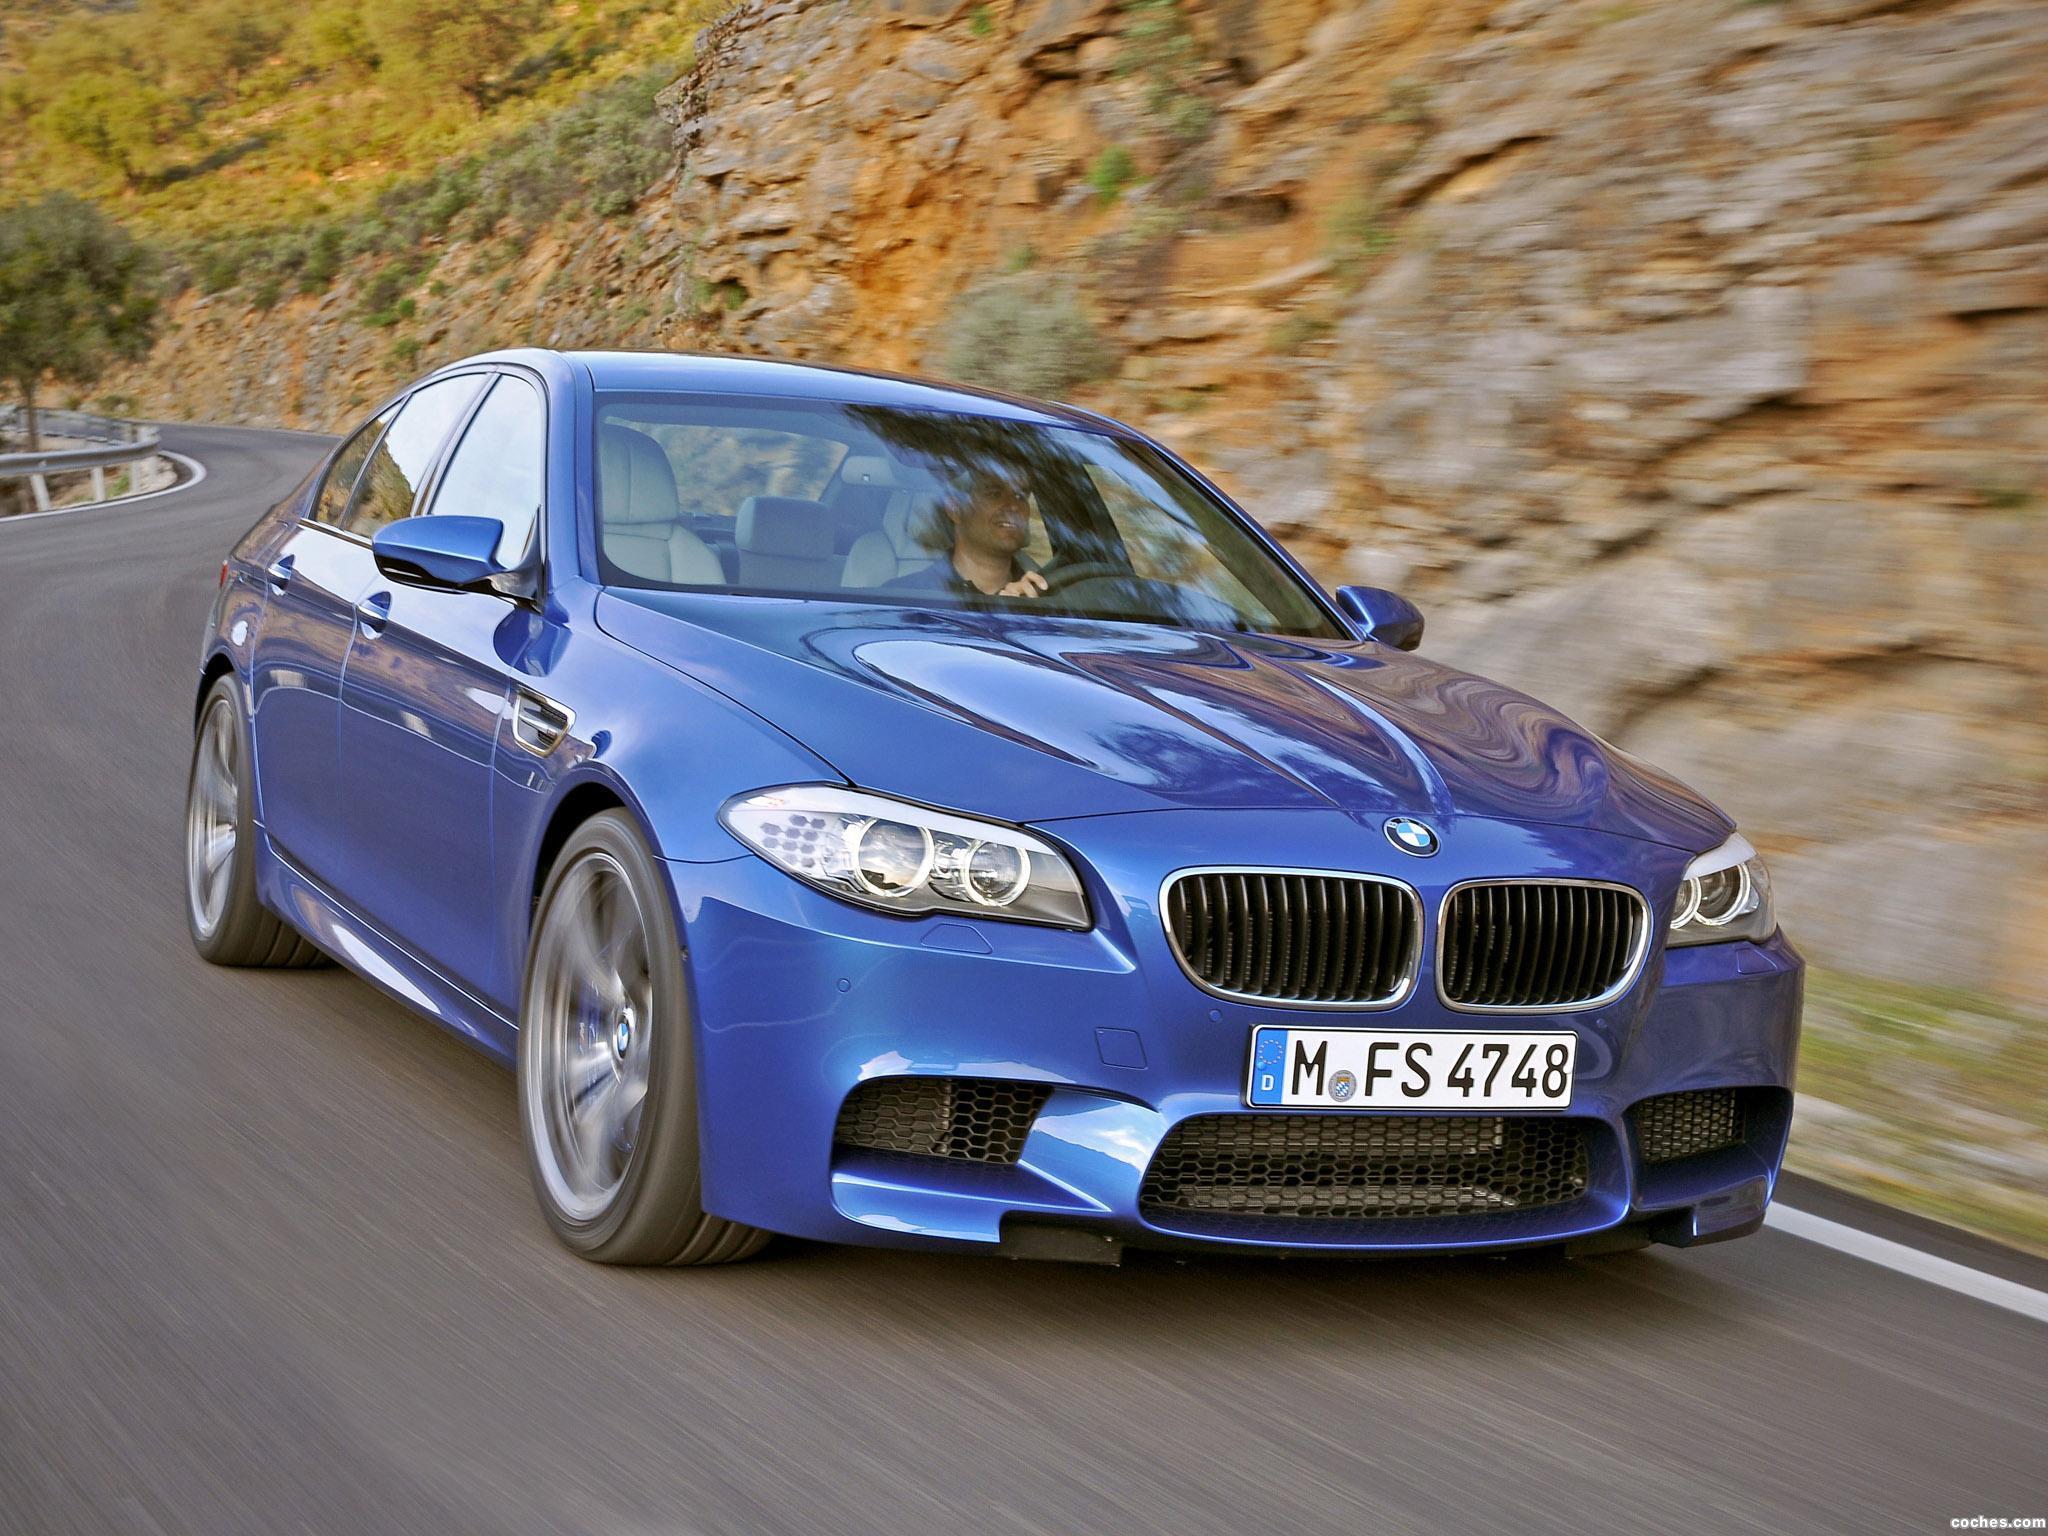 Foto 1 de BMW M5 Sedan F10 2011